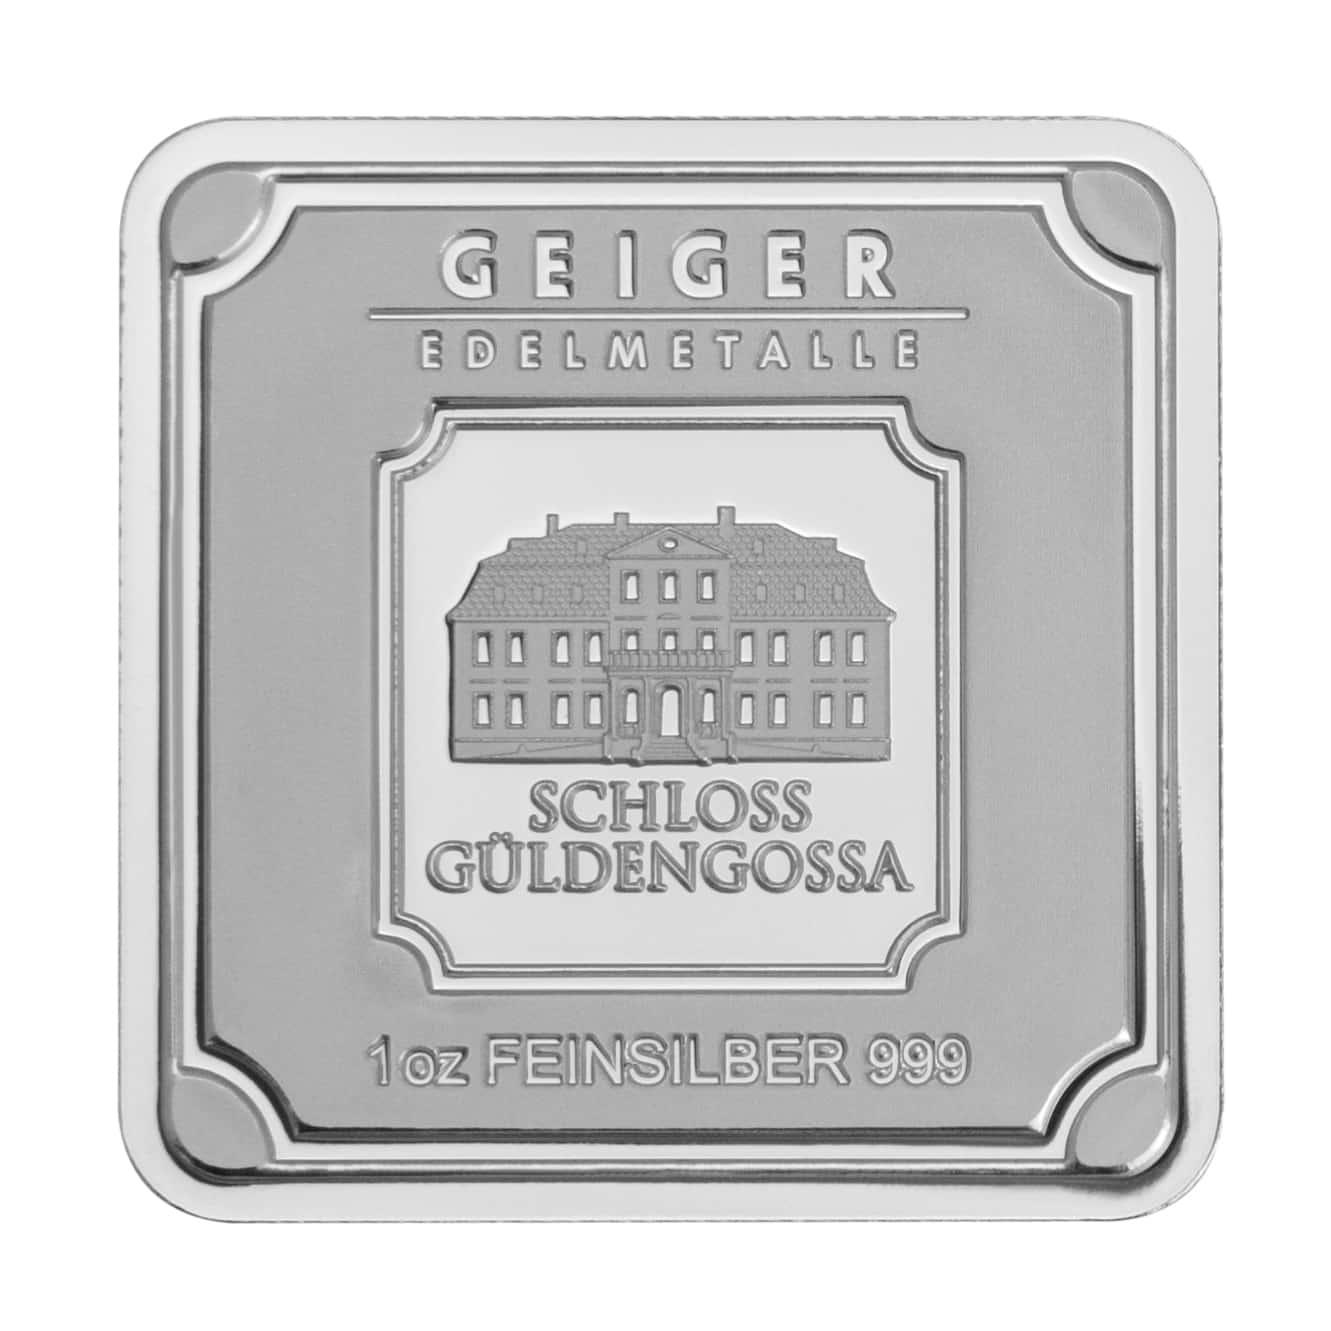 Geiger Edelmetalle 1oz .999 Silver Minted Bullion Bar 1